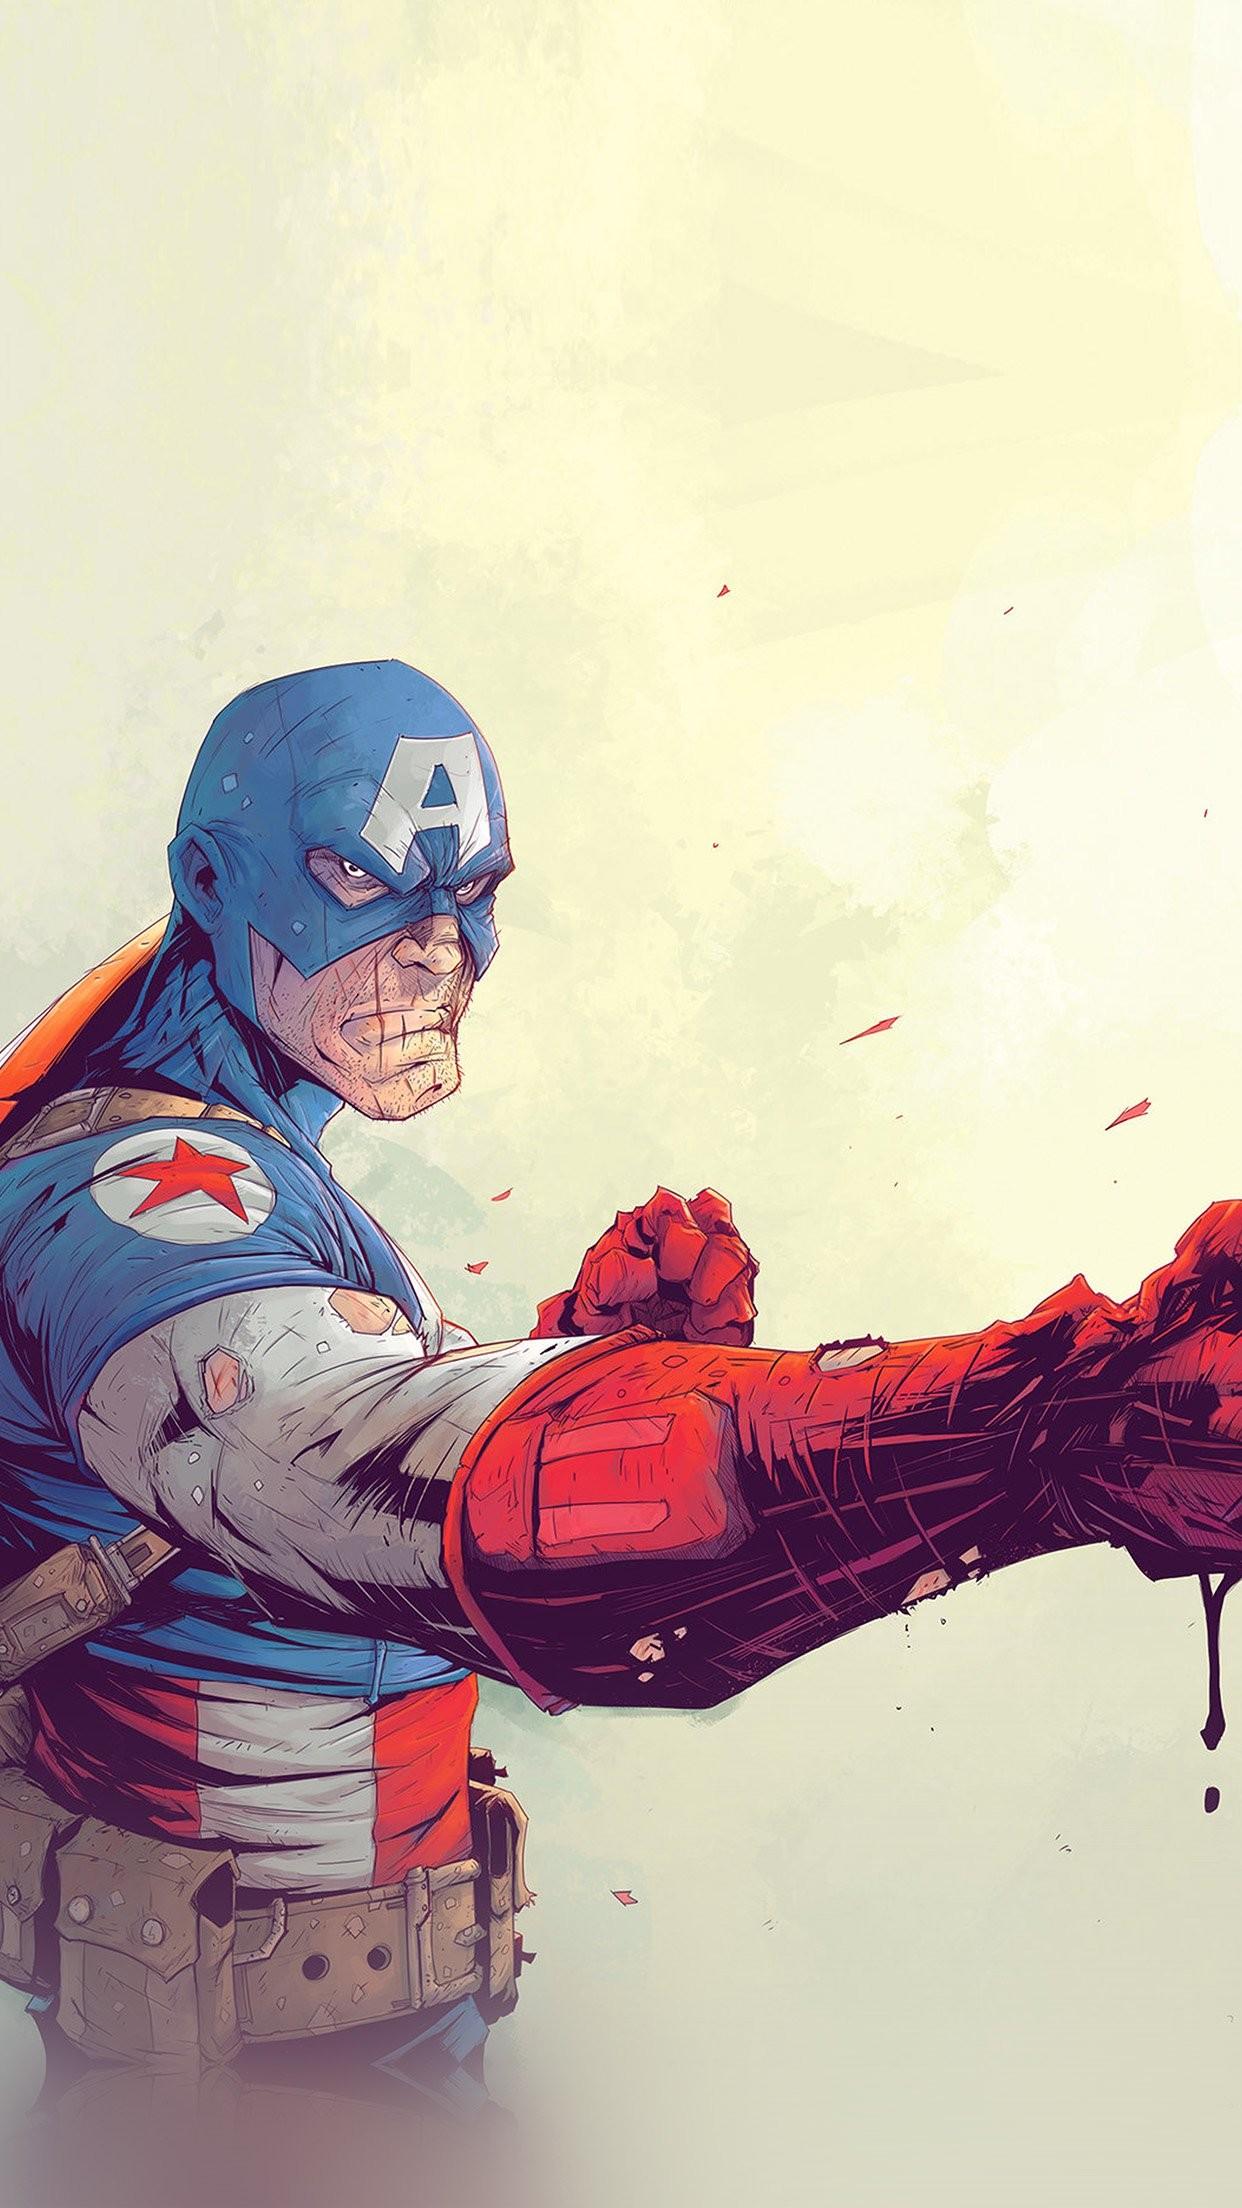 … american flag wallpapers wallpaper cave; download toronto revolver  ilration art anime hero captain …